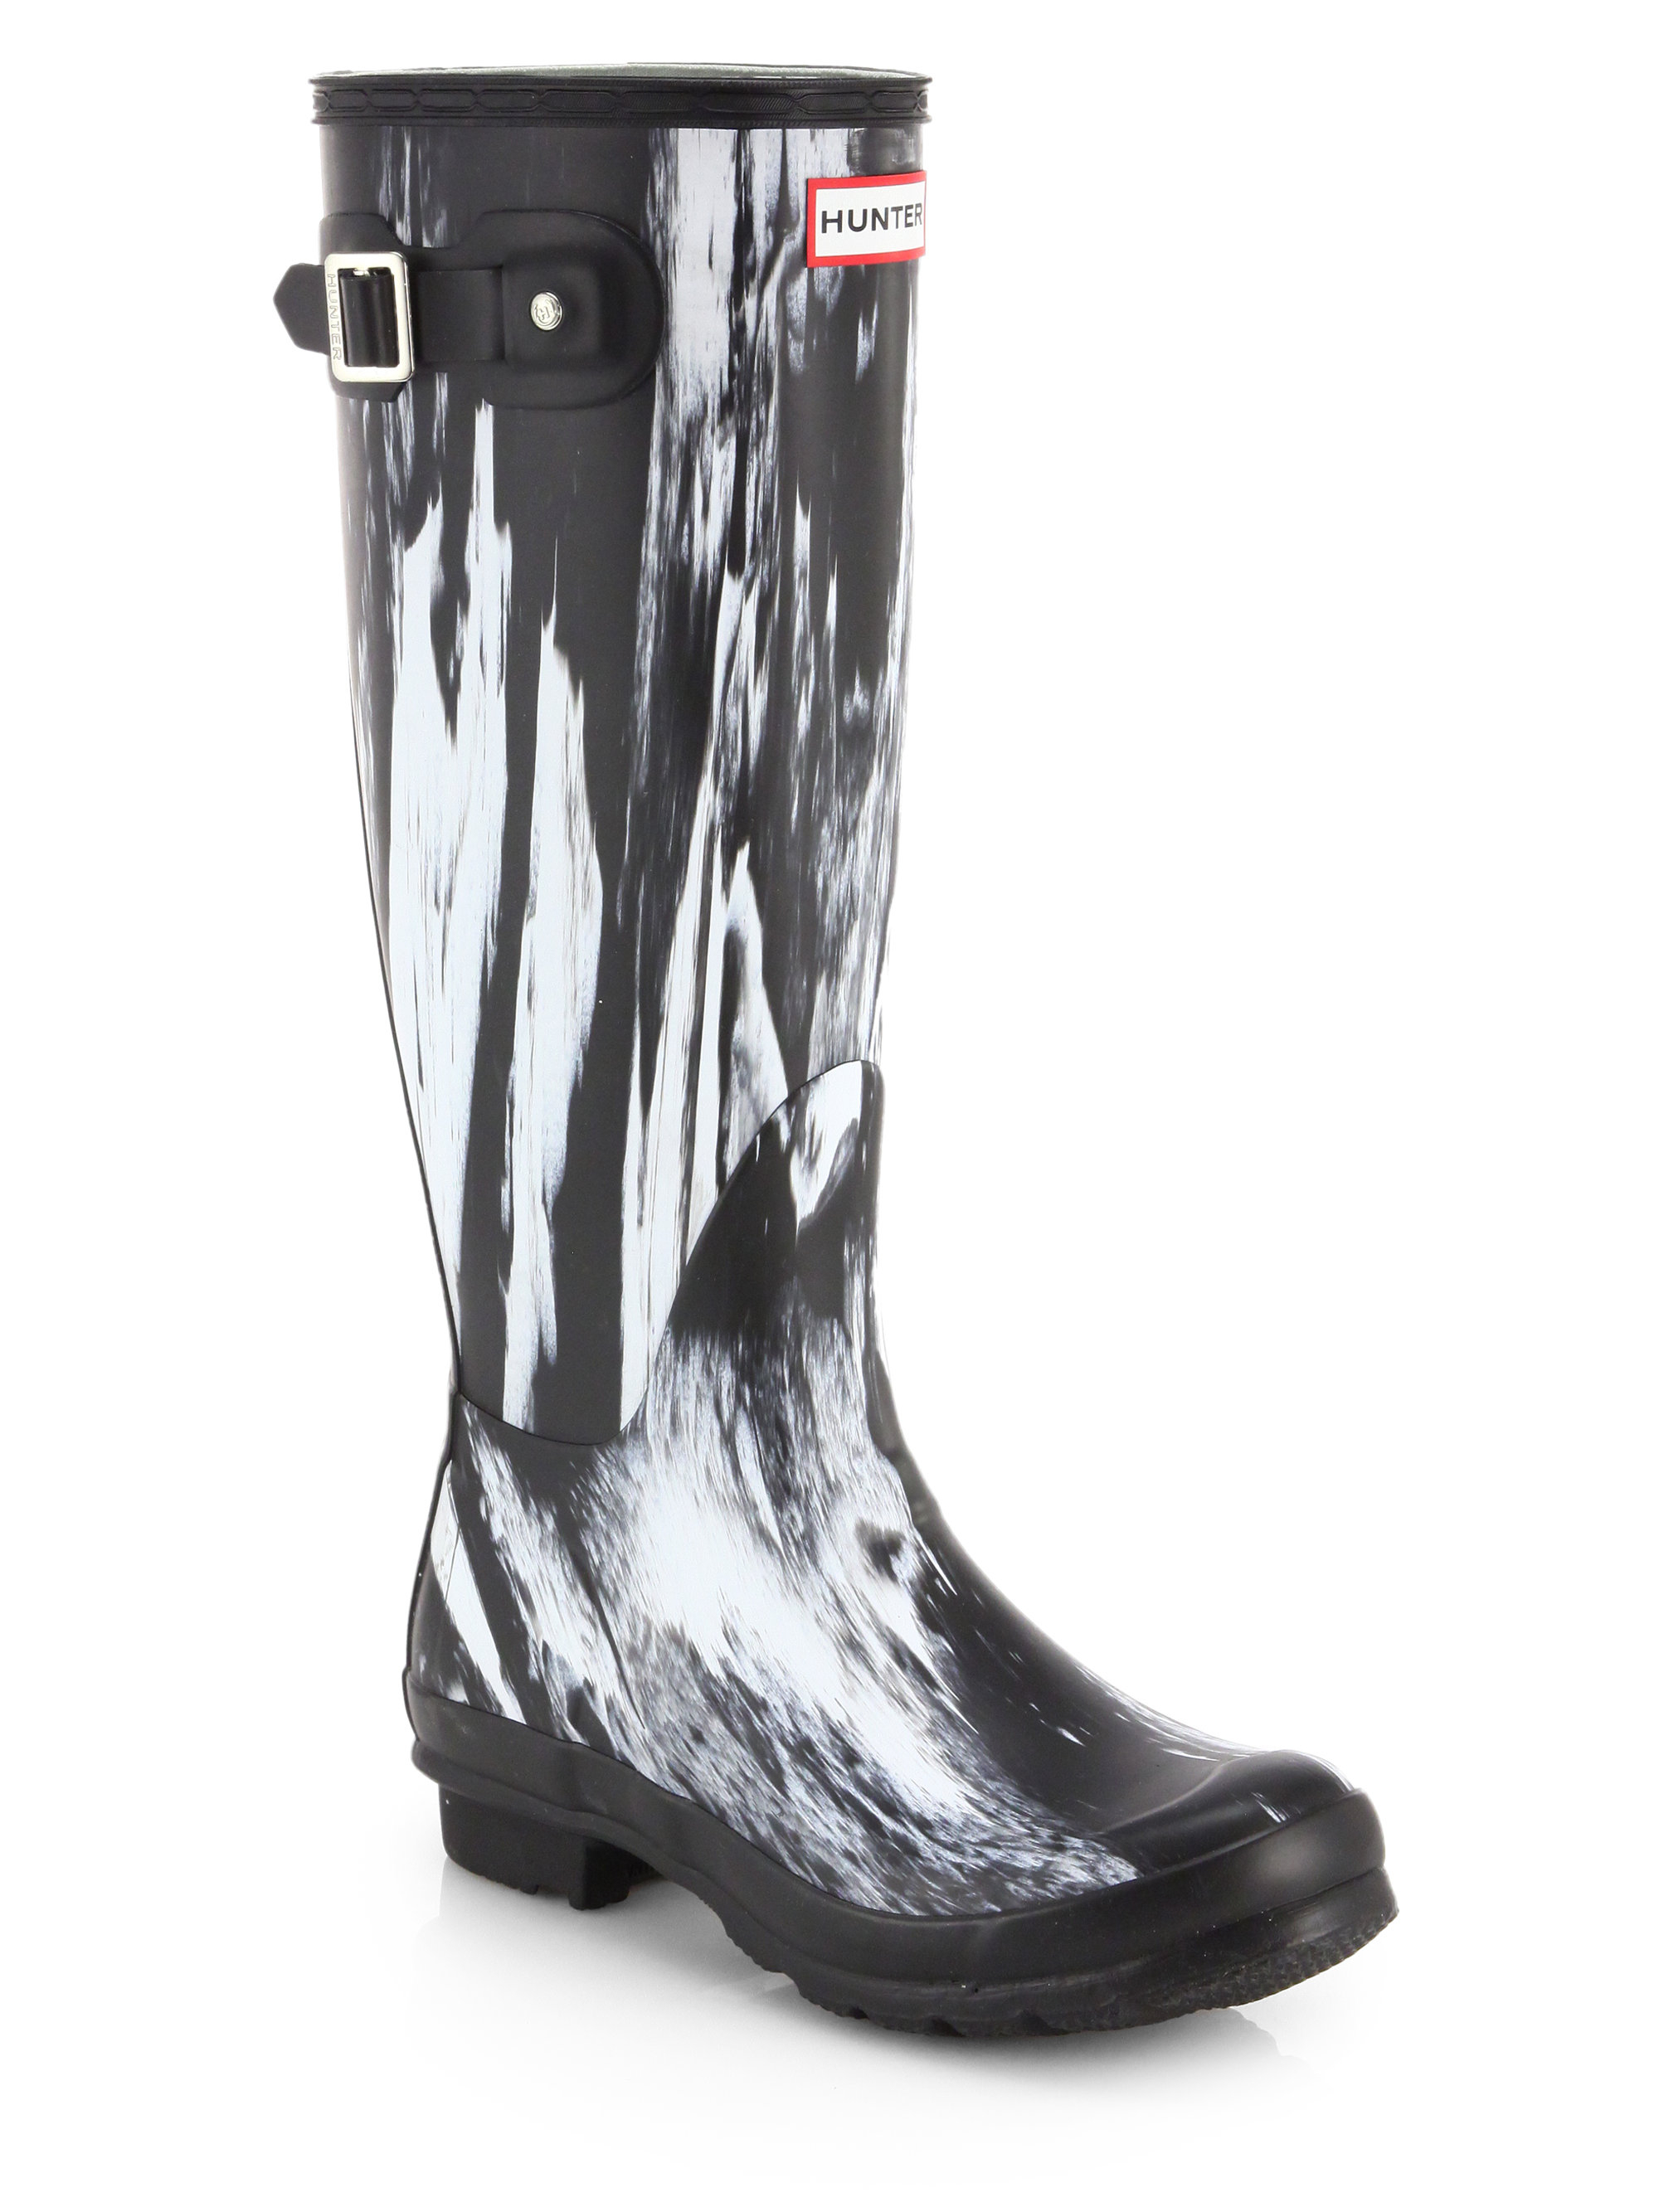 Hunter Original Night Rain Boots in Black | Lyst